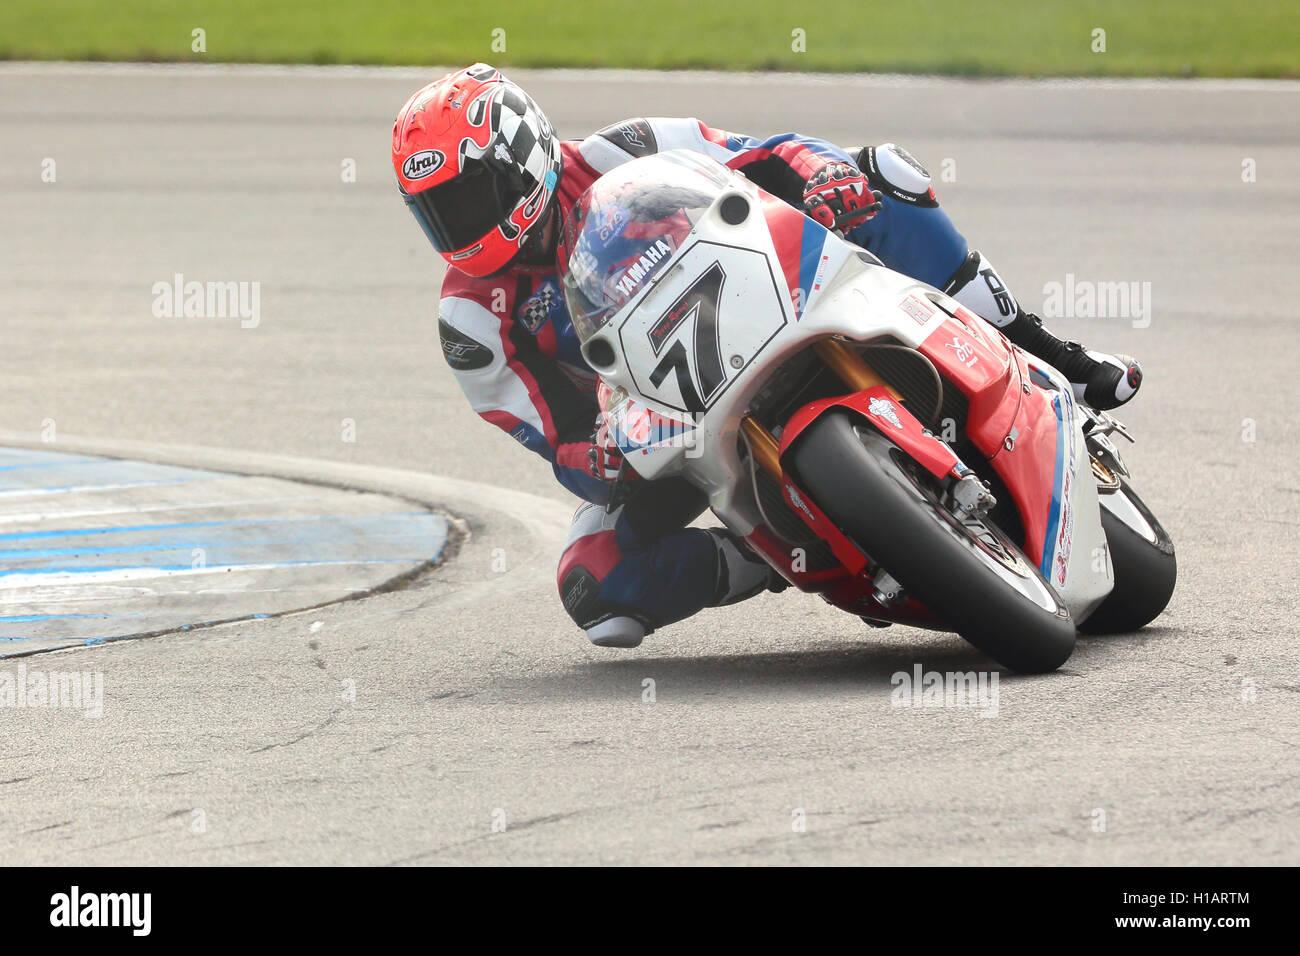 Donington Park, Derbyshire, UK. 23rd September 2016. Ex-Grand Prix, World Superbikes and British Superbikes rider - Stock Image